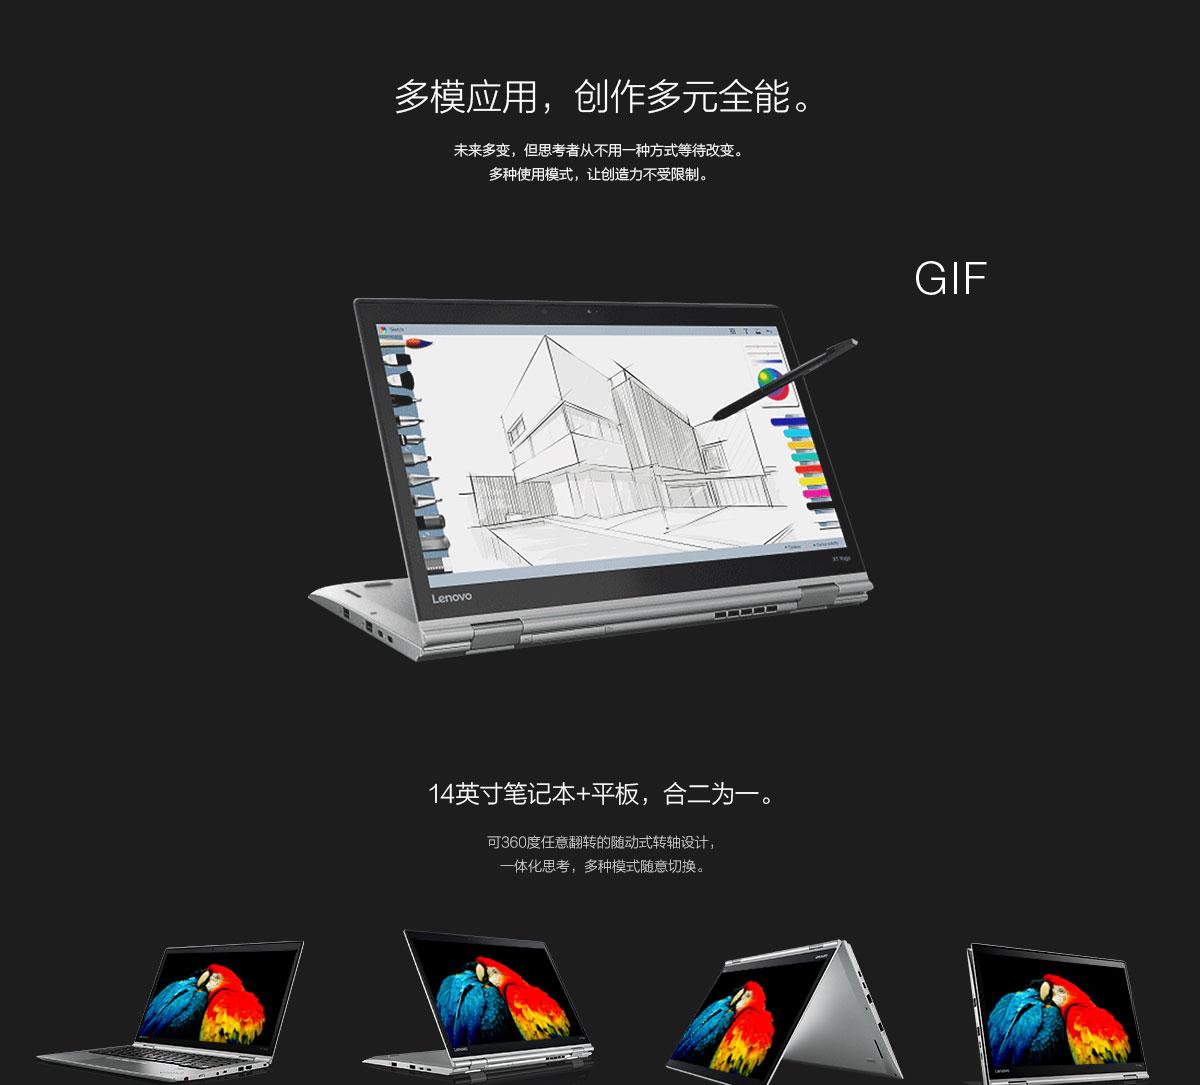 ThinkpadX1 Yoga 2017 银色版(PC)2